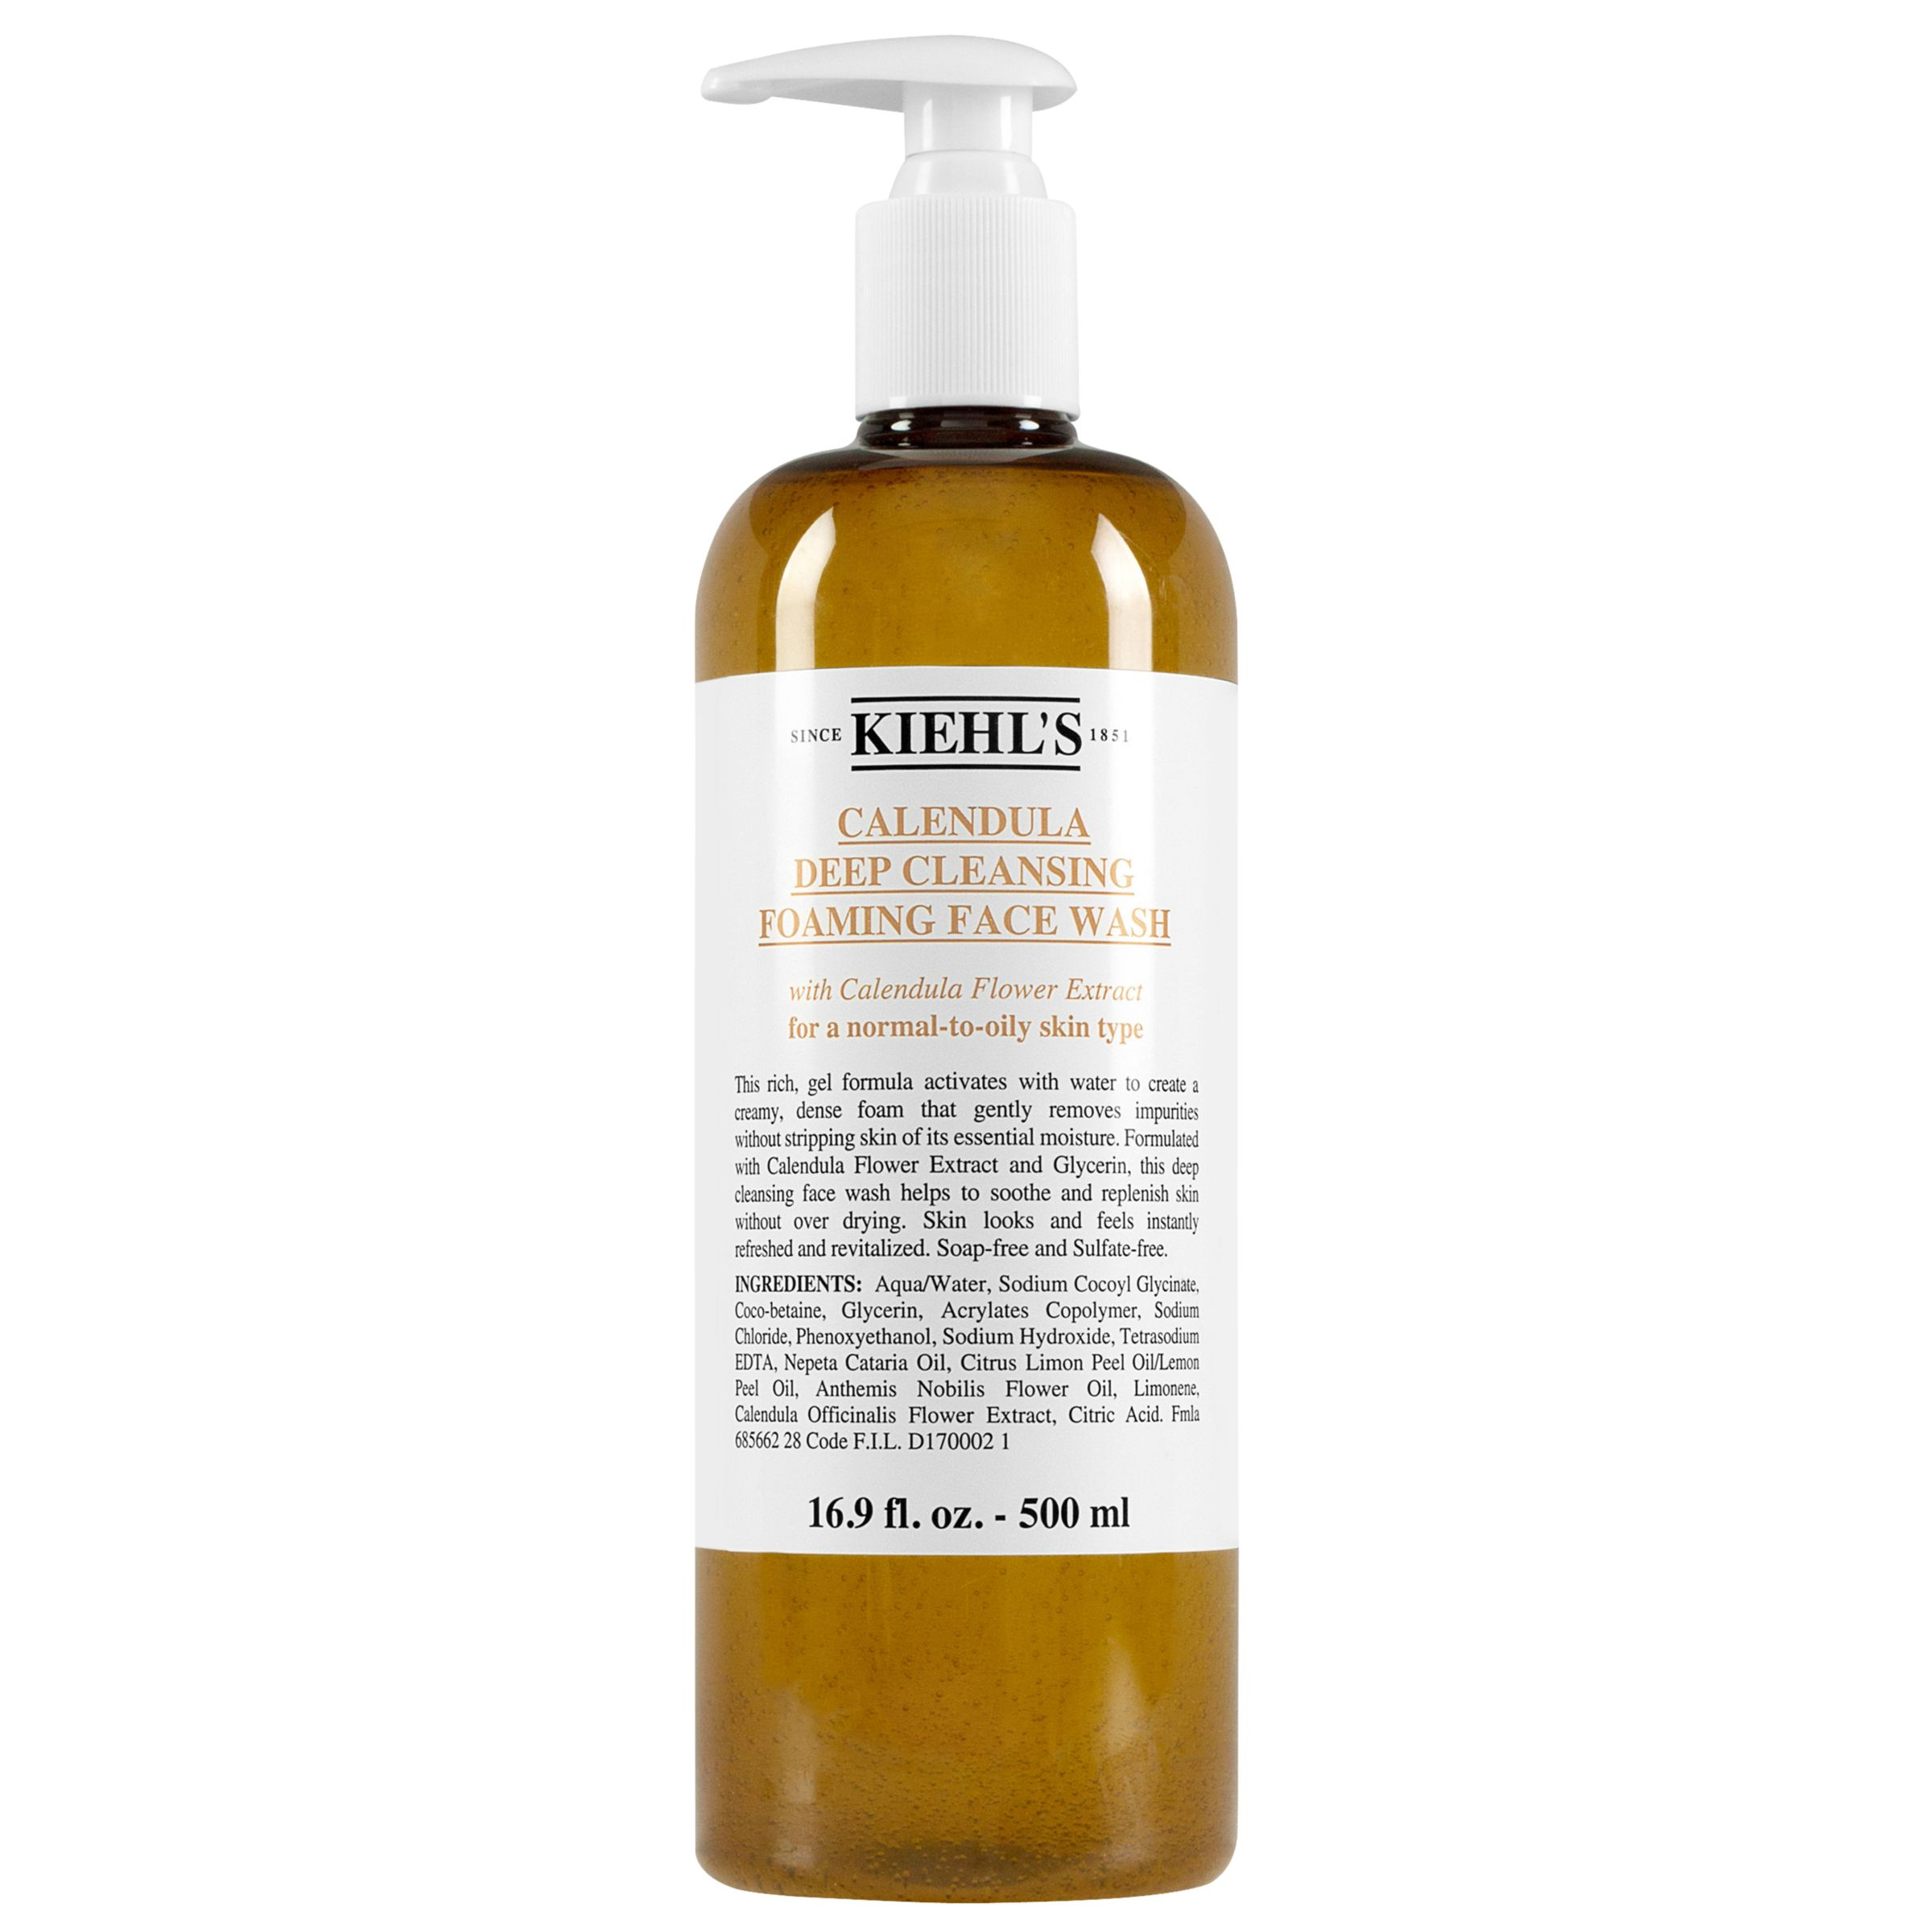 Kiehls Kiehl's Calendula Deep Cleansing Foaming Face Wash, 500ml